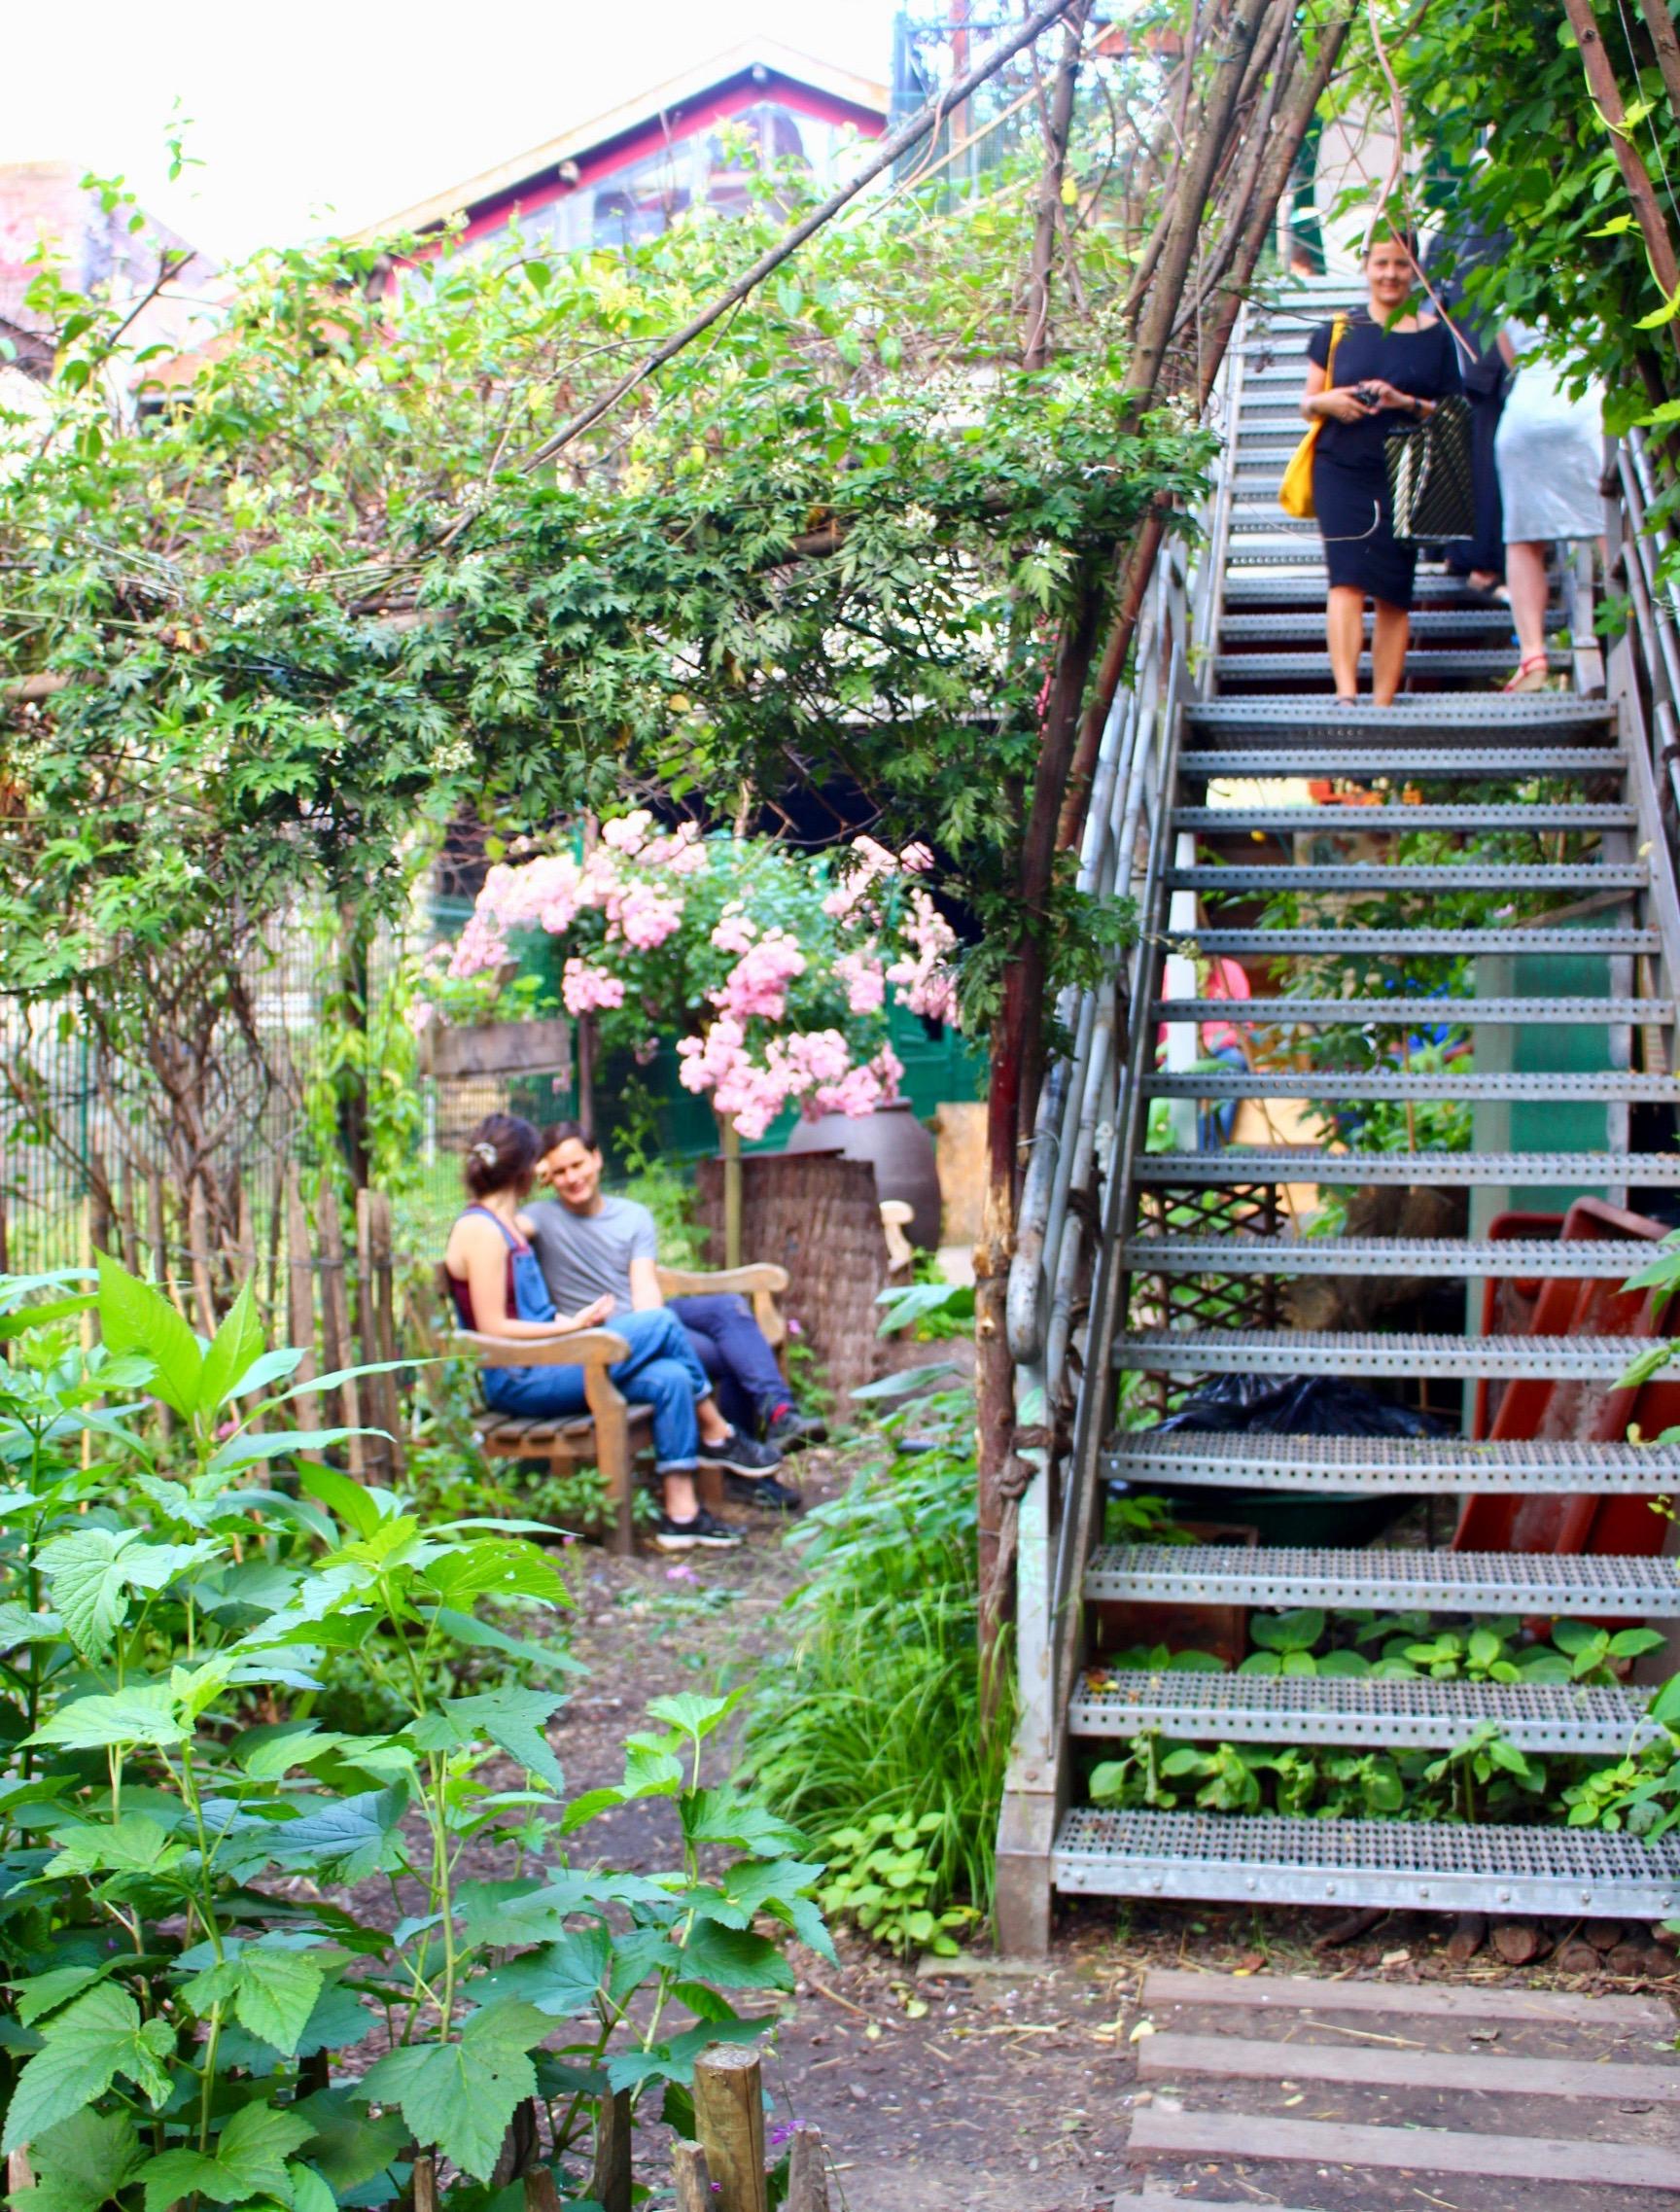 jardins-ecologique-agro-ecologie-paris.jpg